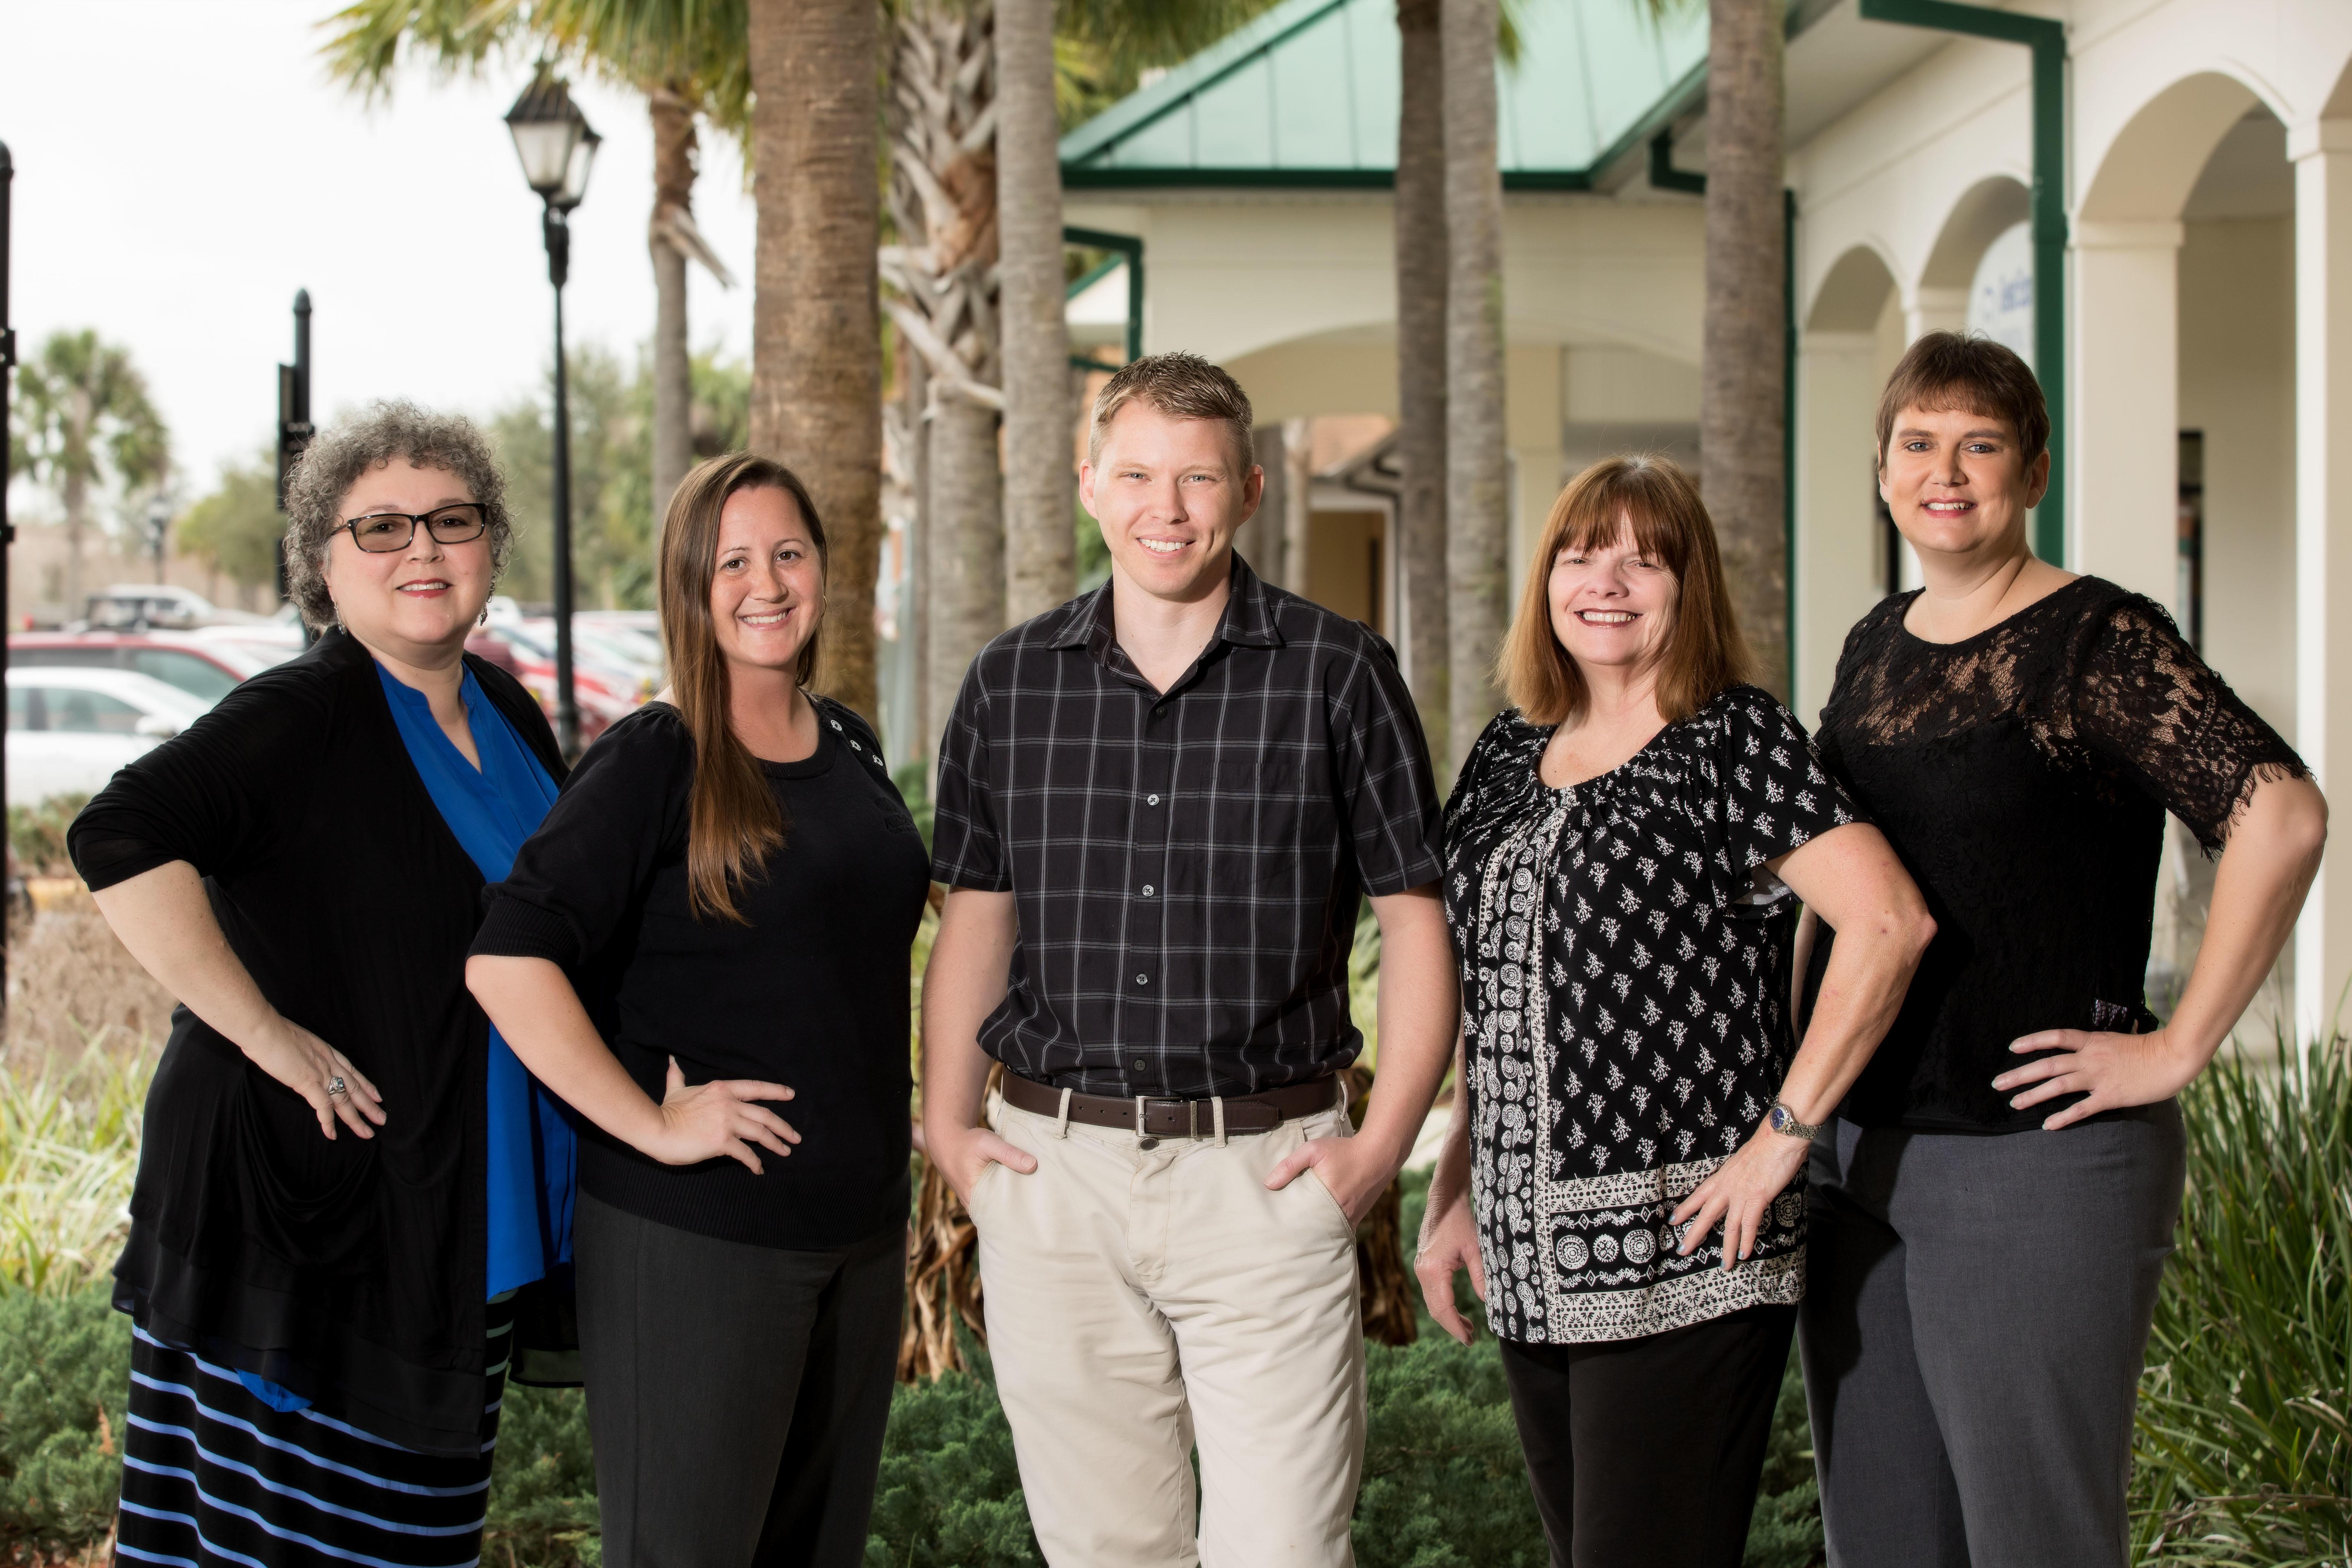 Kevin W. McDonald: Allstate Insurance image 5